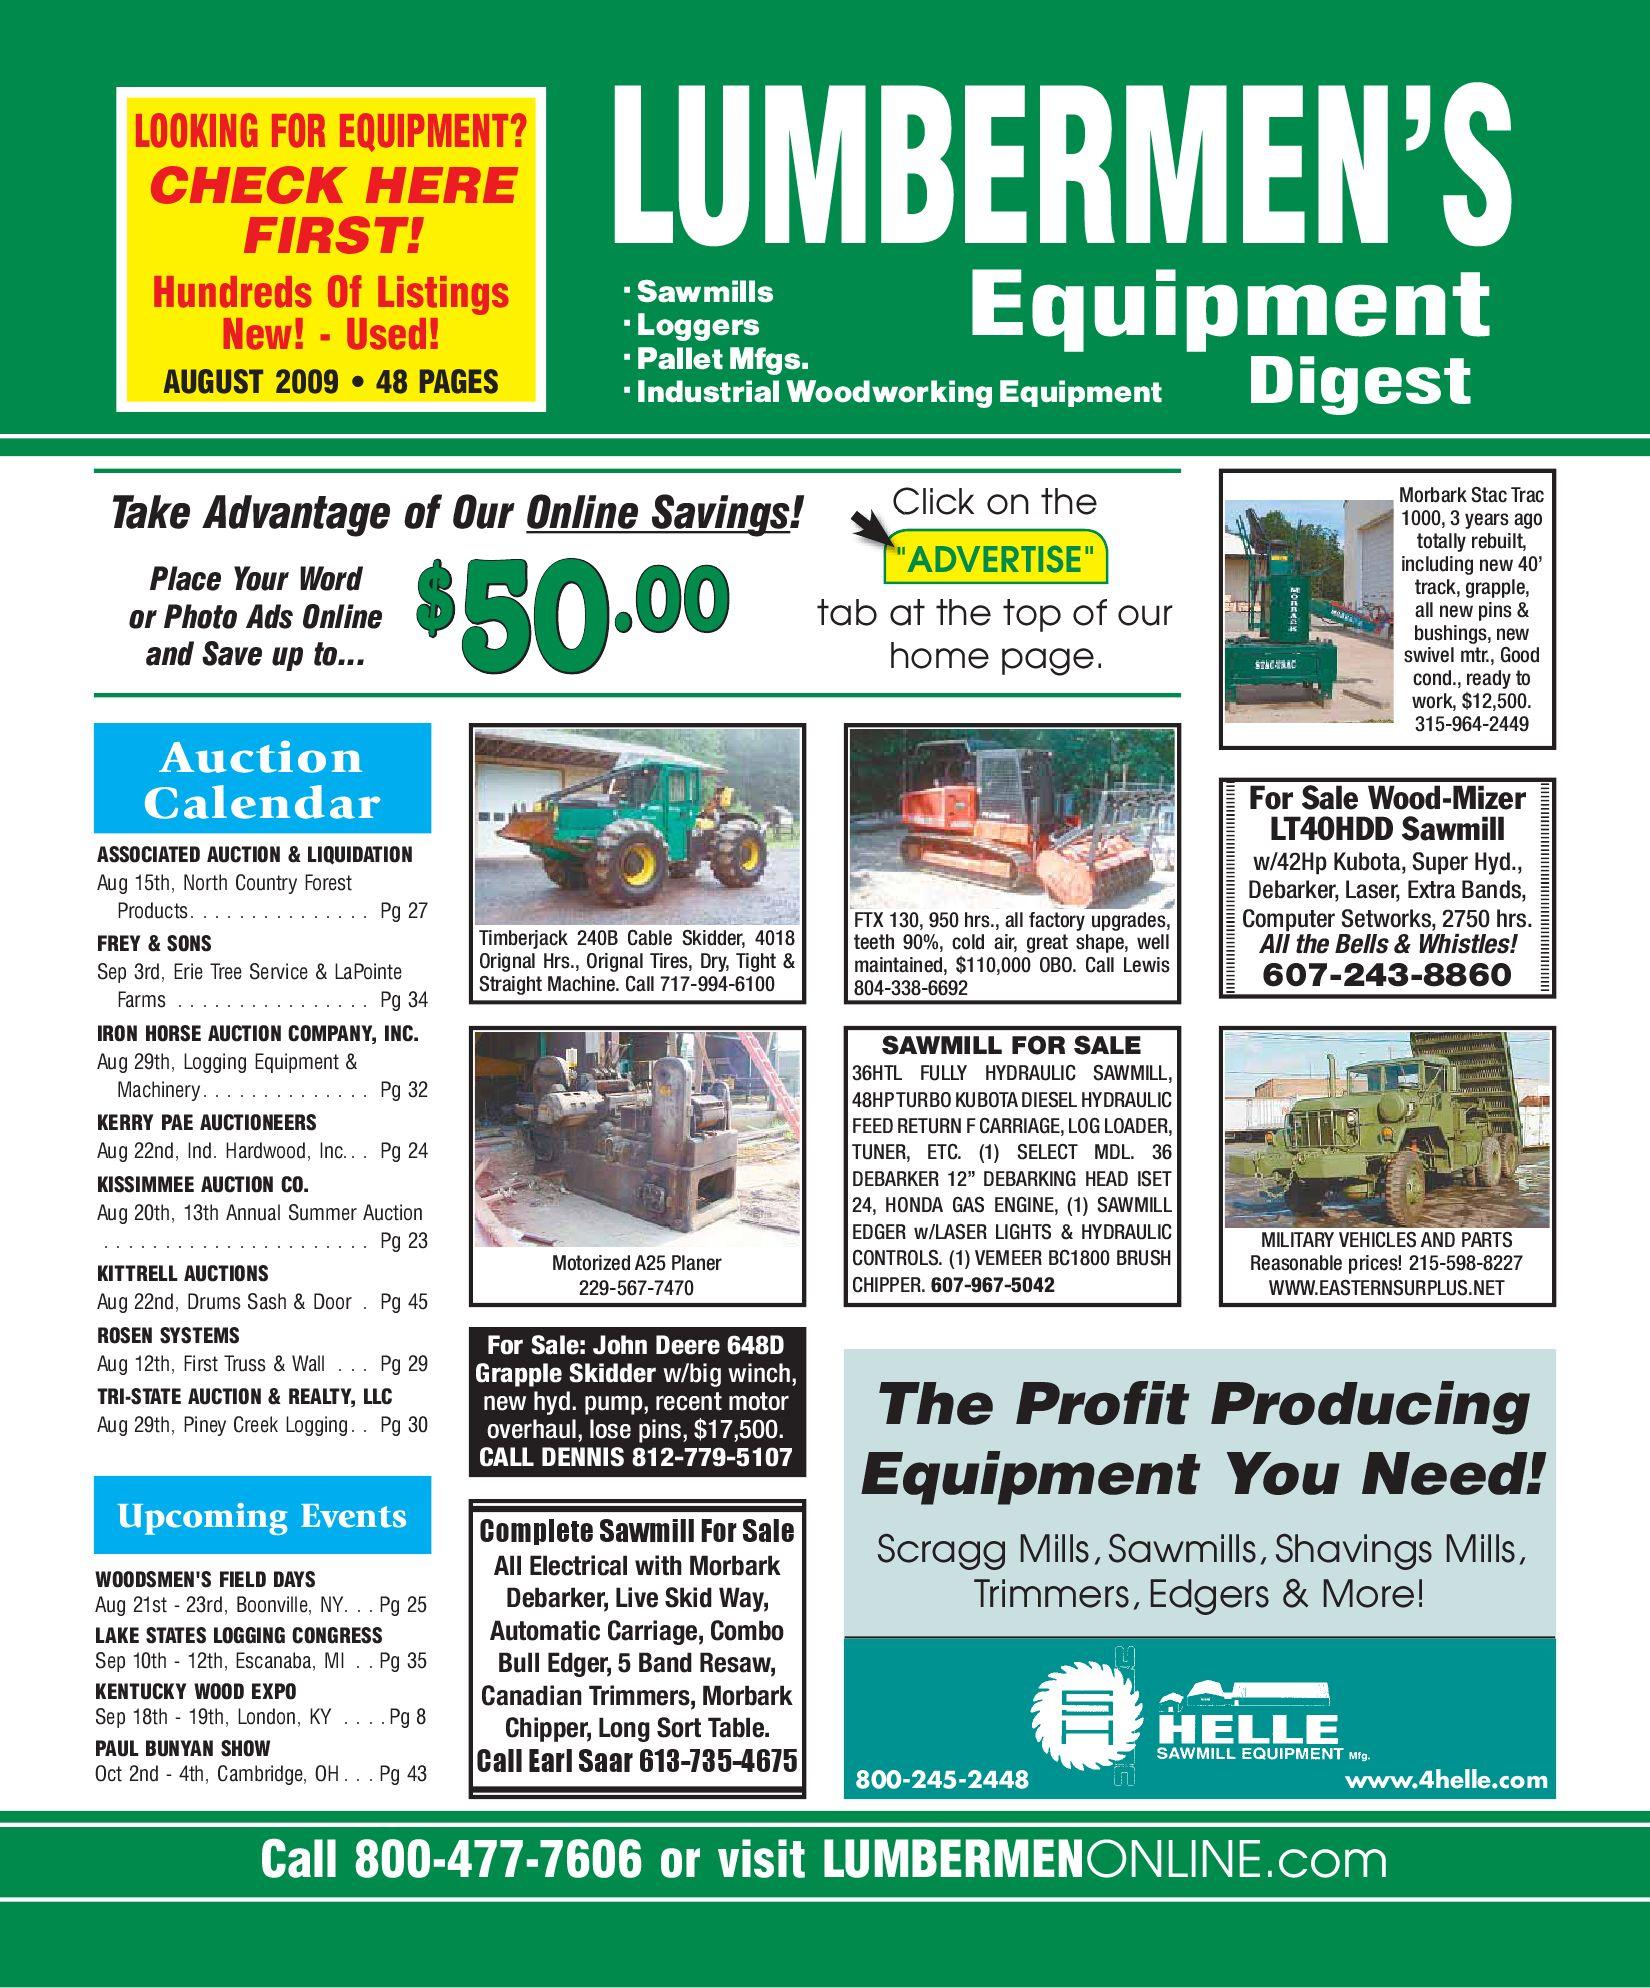 August 2009 / LUMBERMEN'S Equipment Digest by LUMBERMEN'S Equipment